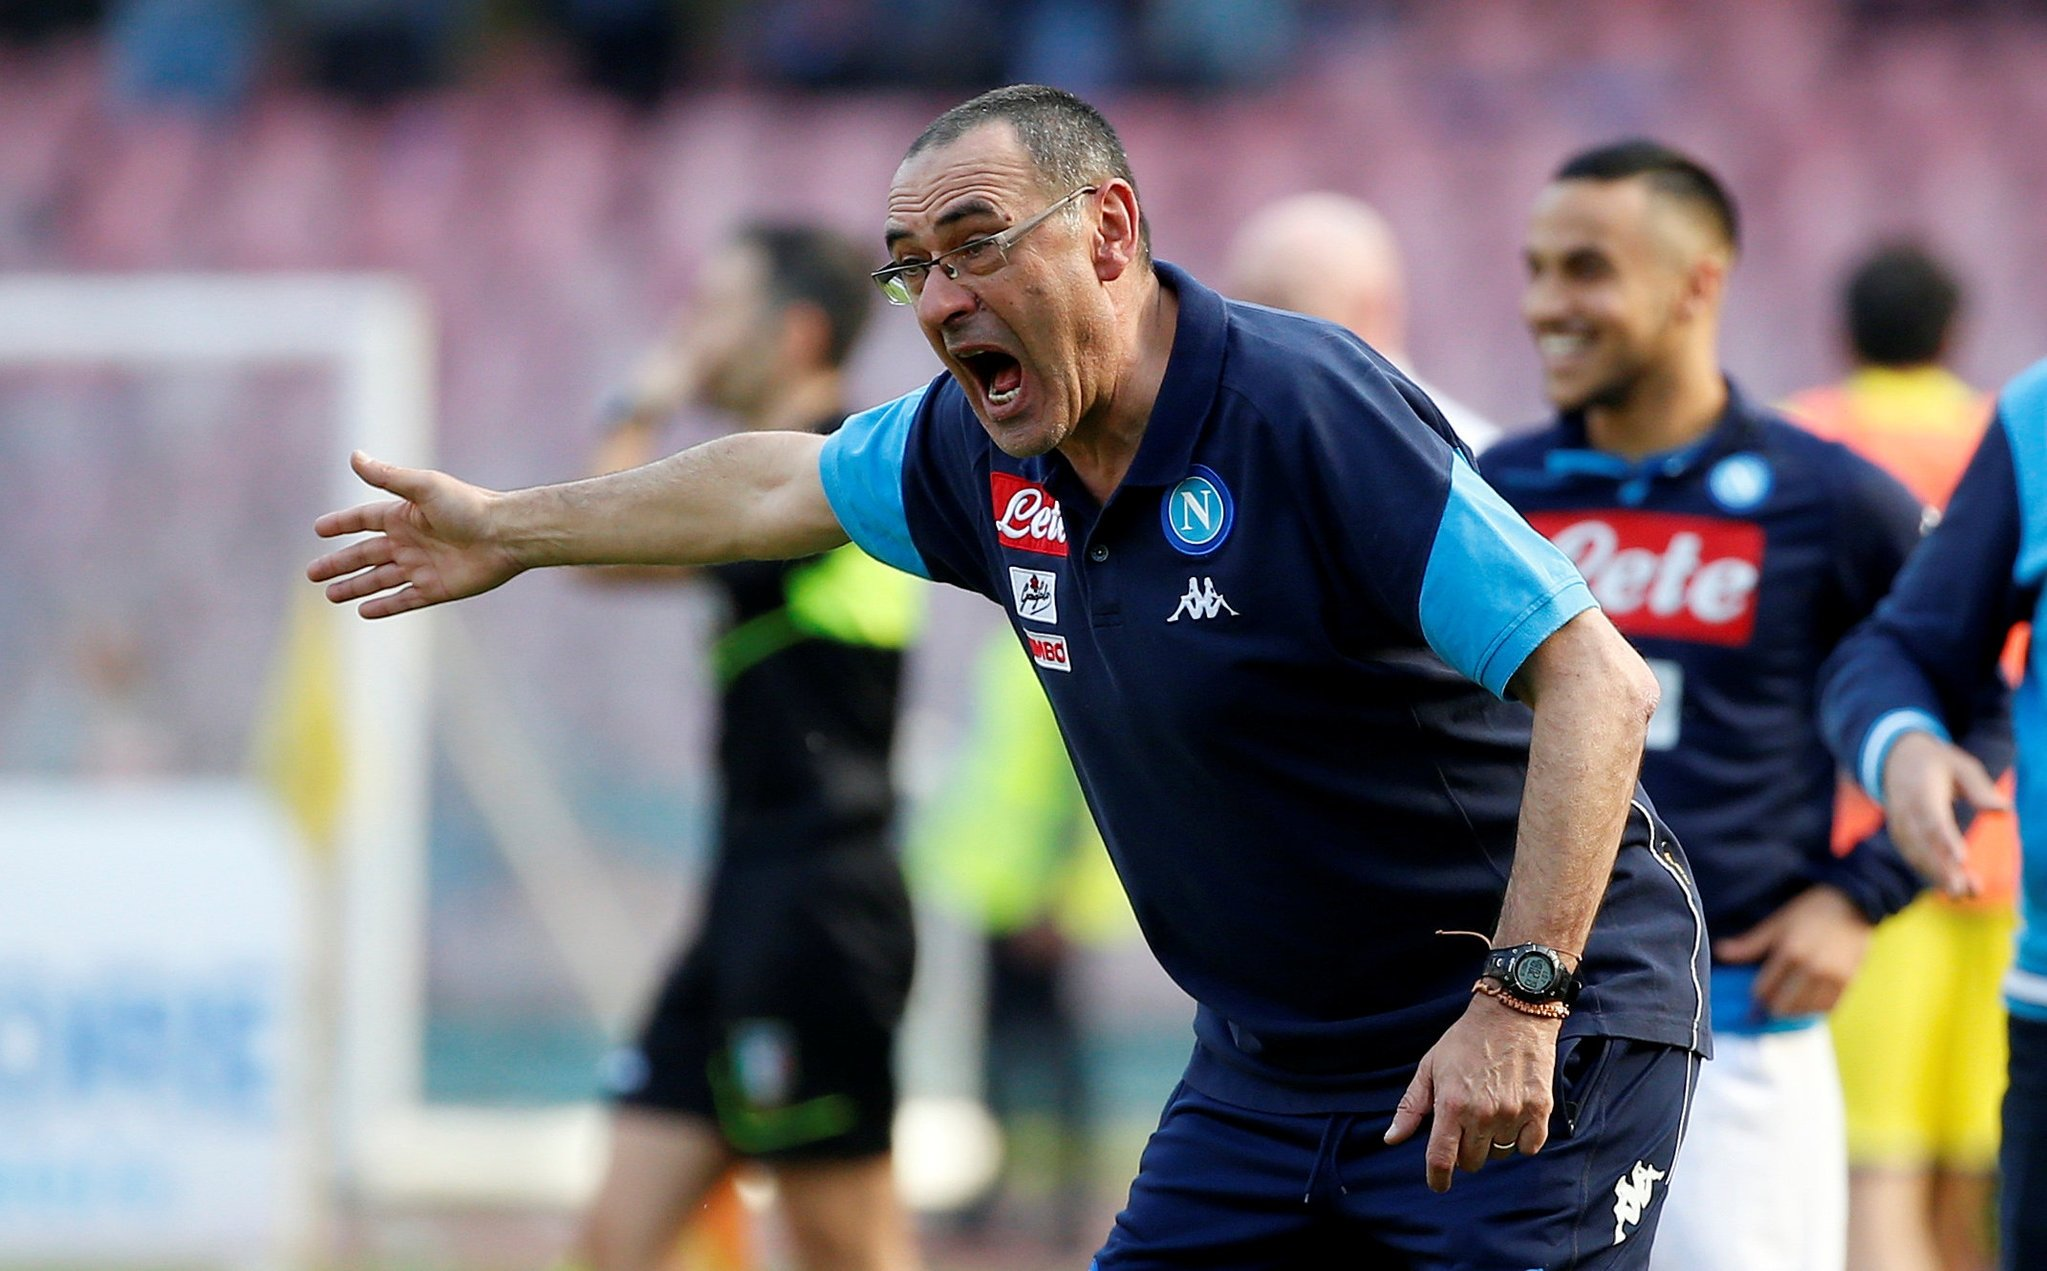 İtalyanlardan flaş iddia: Galatasaray'da Fatih Terim'in yerine Sarri!..